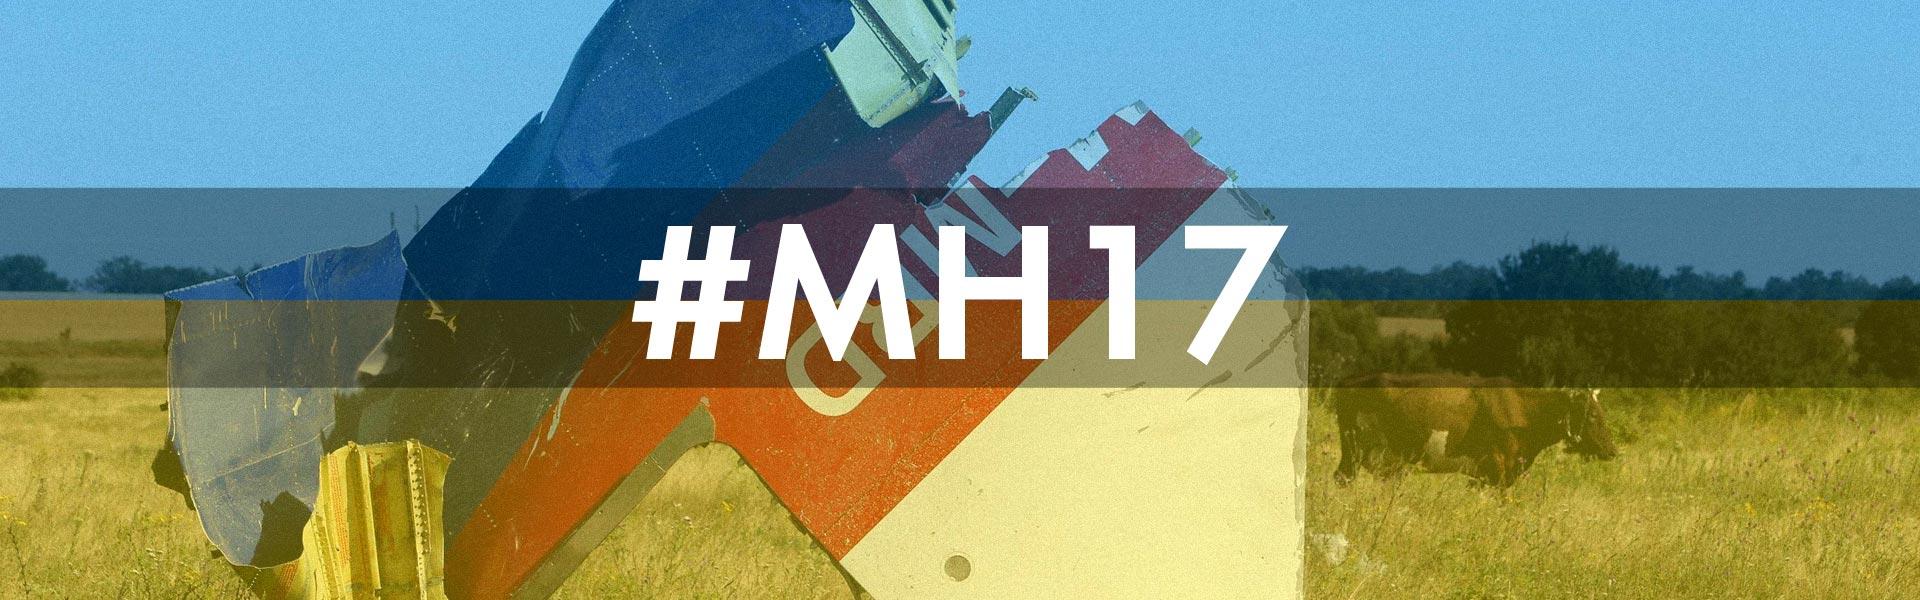 MH17. Хроники горящей шапки.